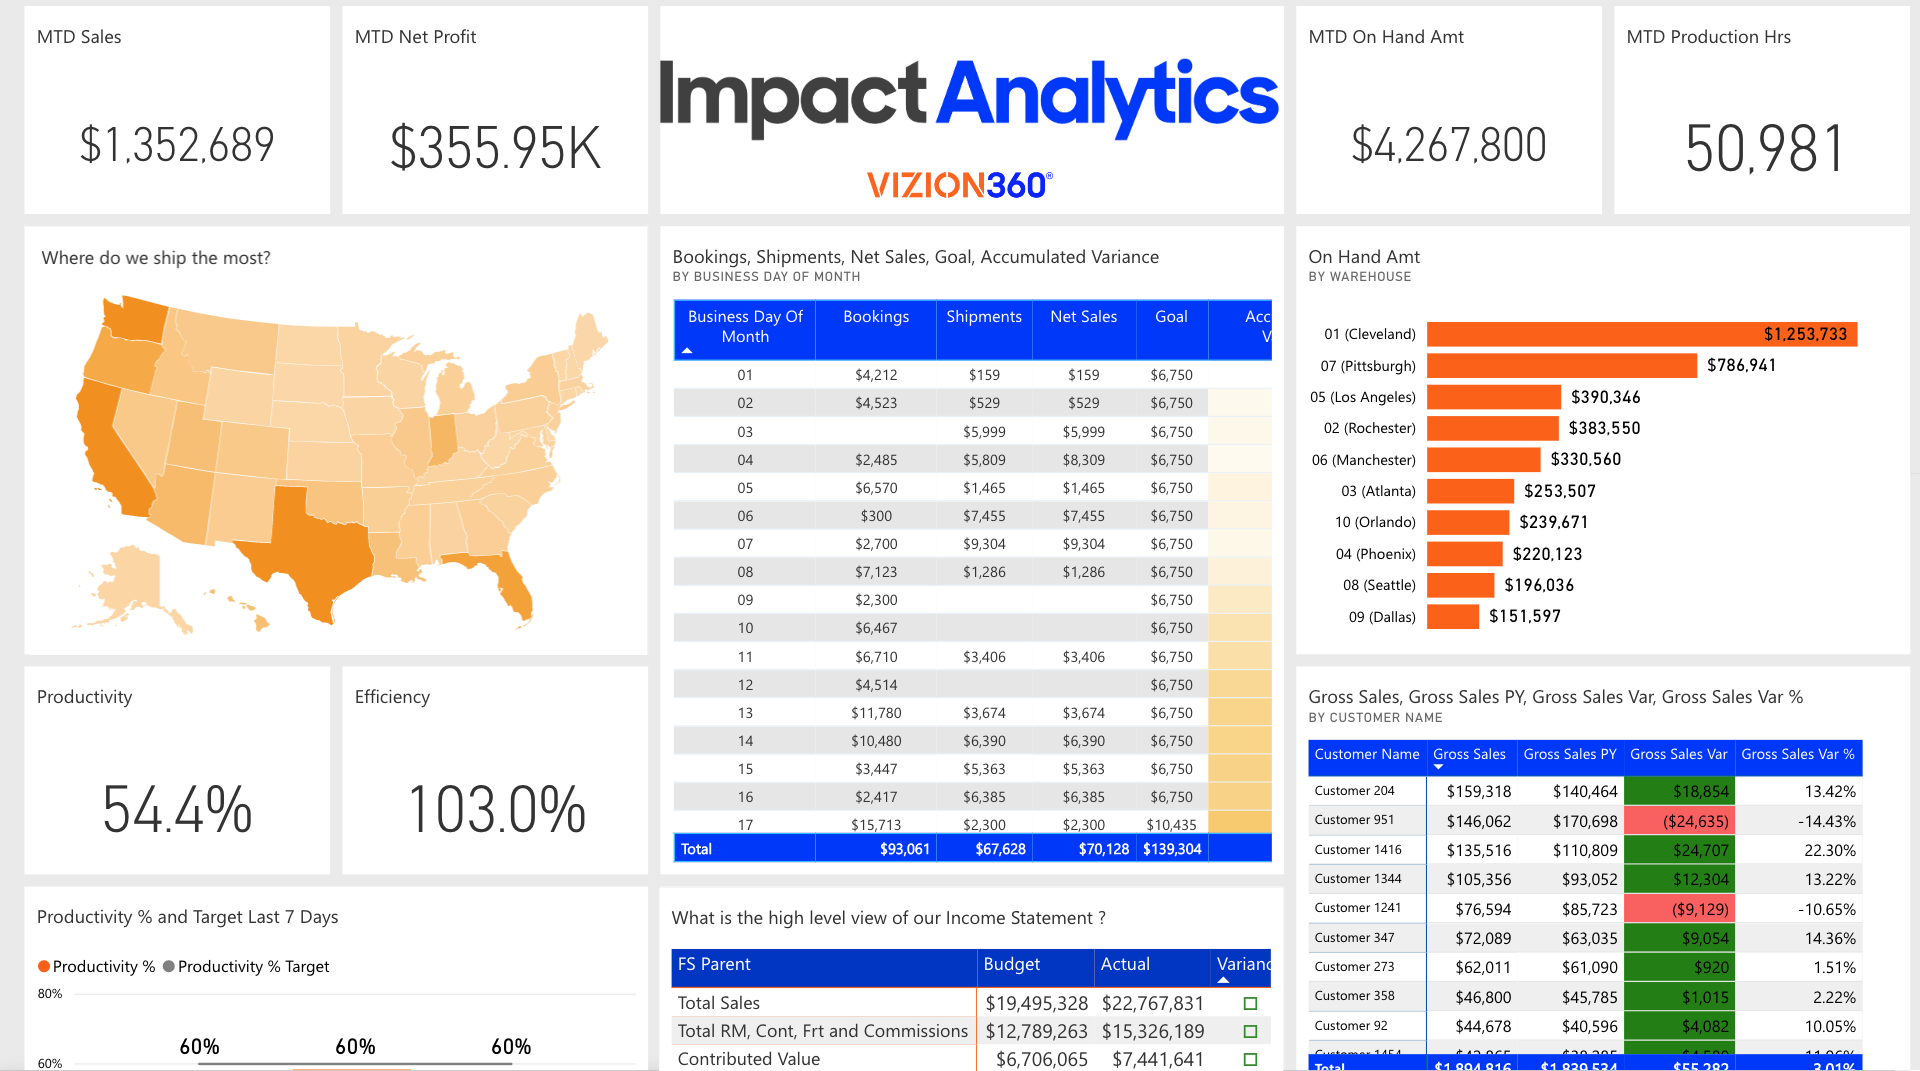 Vizion360 Impact Analytics Business Intelligence Platform